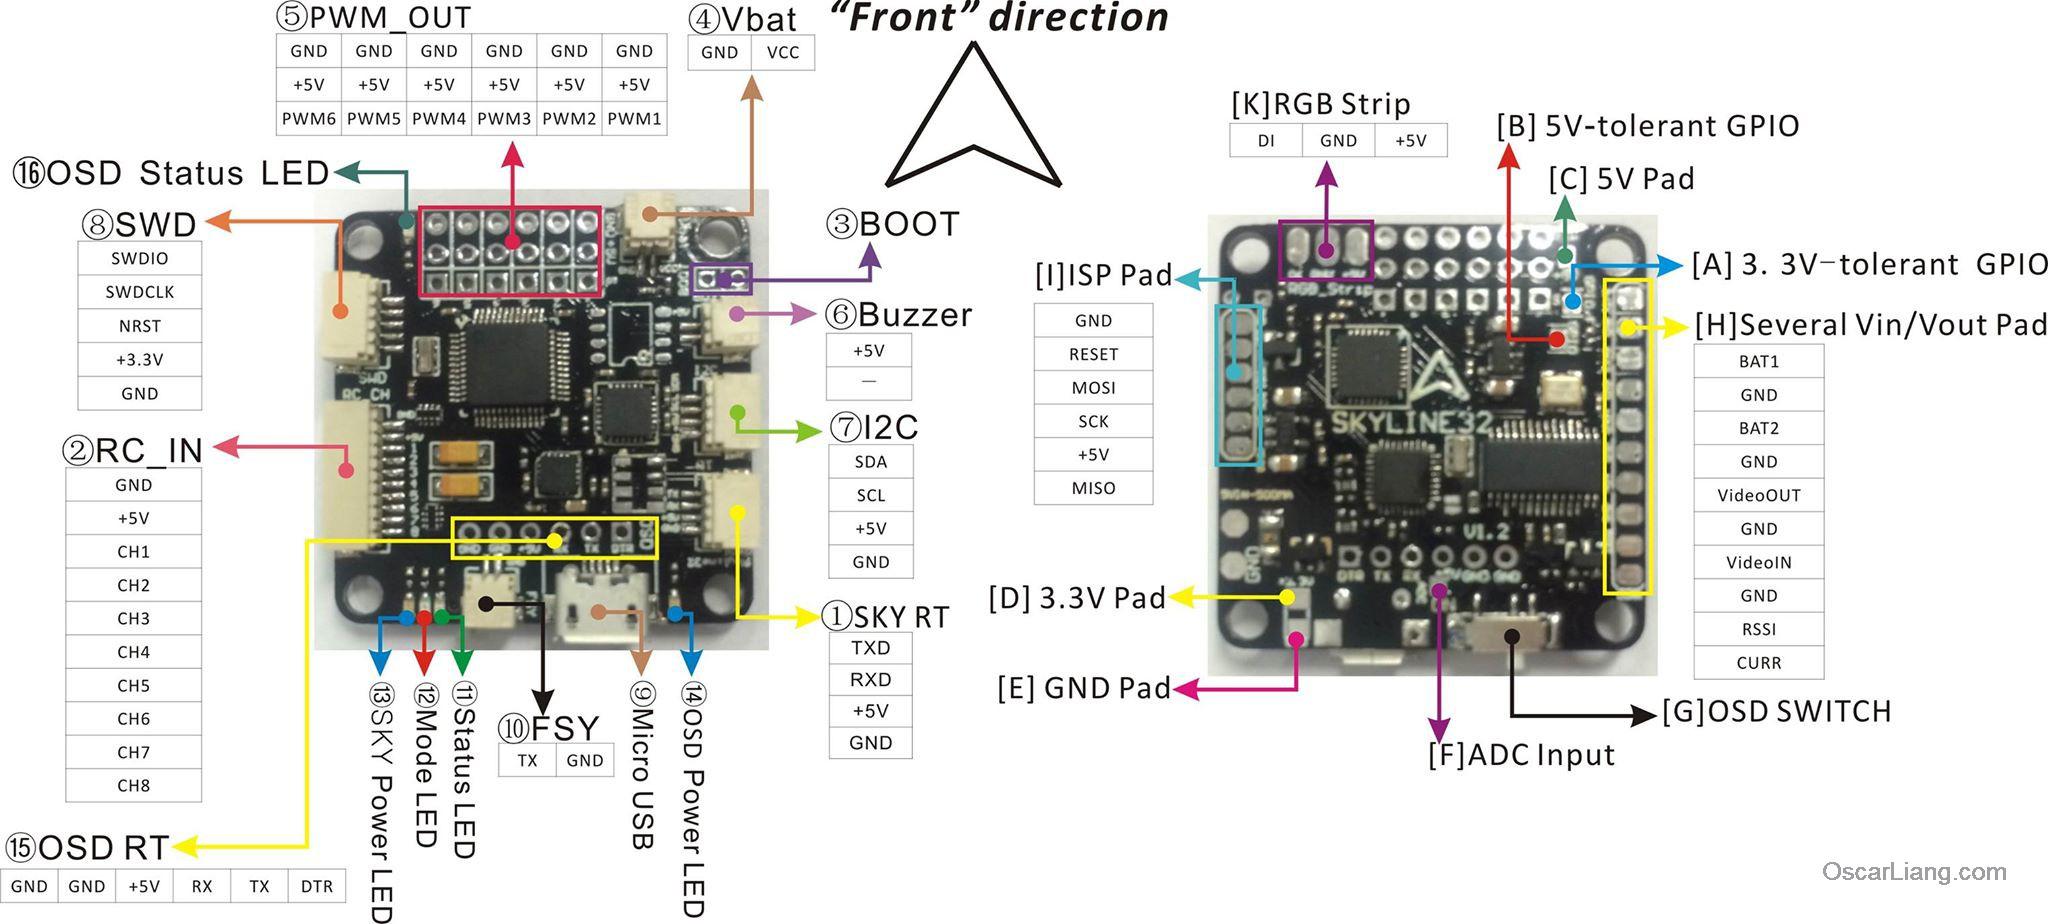 Yks 250 mini quadcopter wiring diagram dolgular yks 250 mini quadcopter wiring diagram dolgular asfbconference2016 Gallery